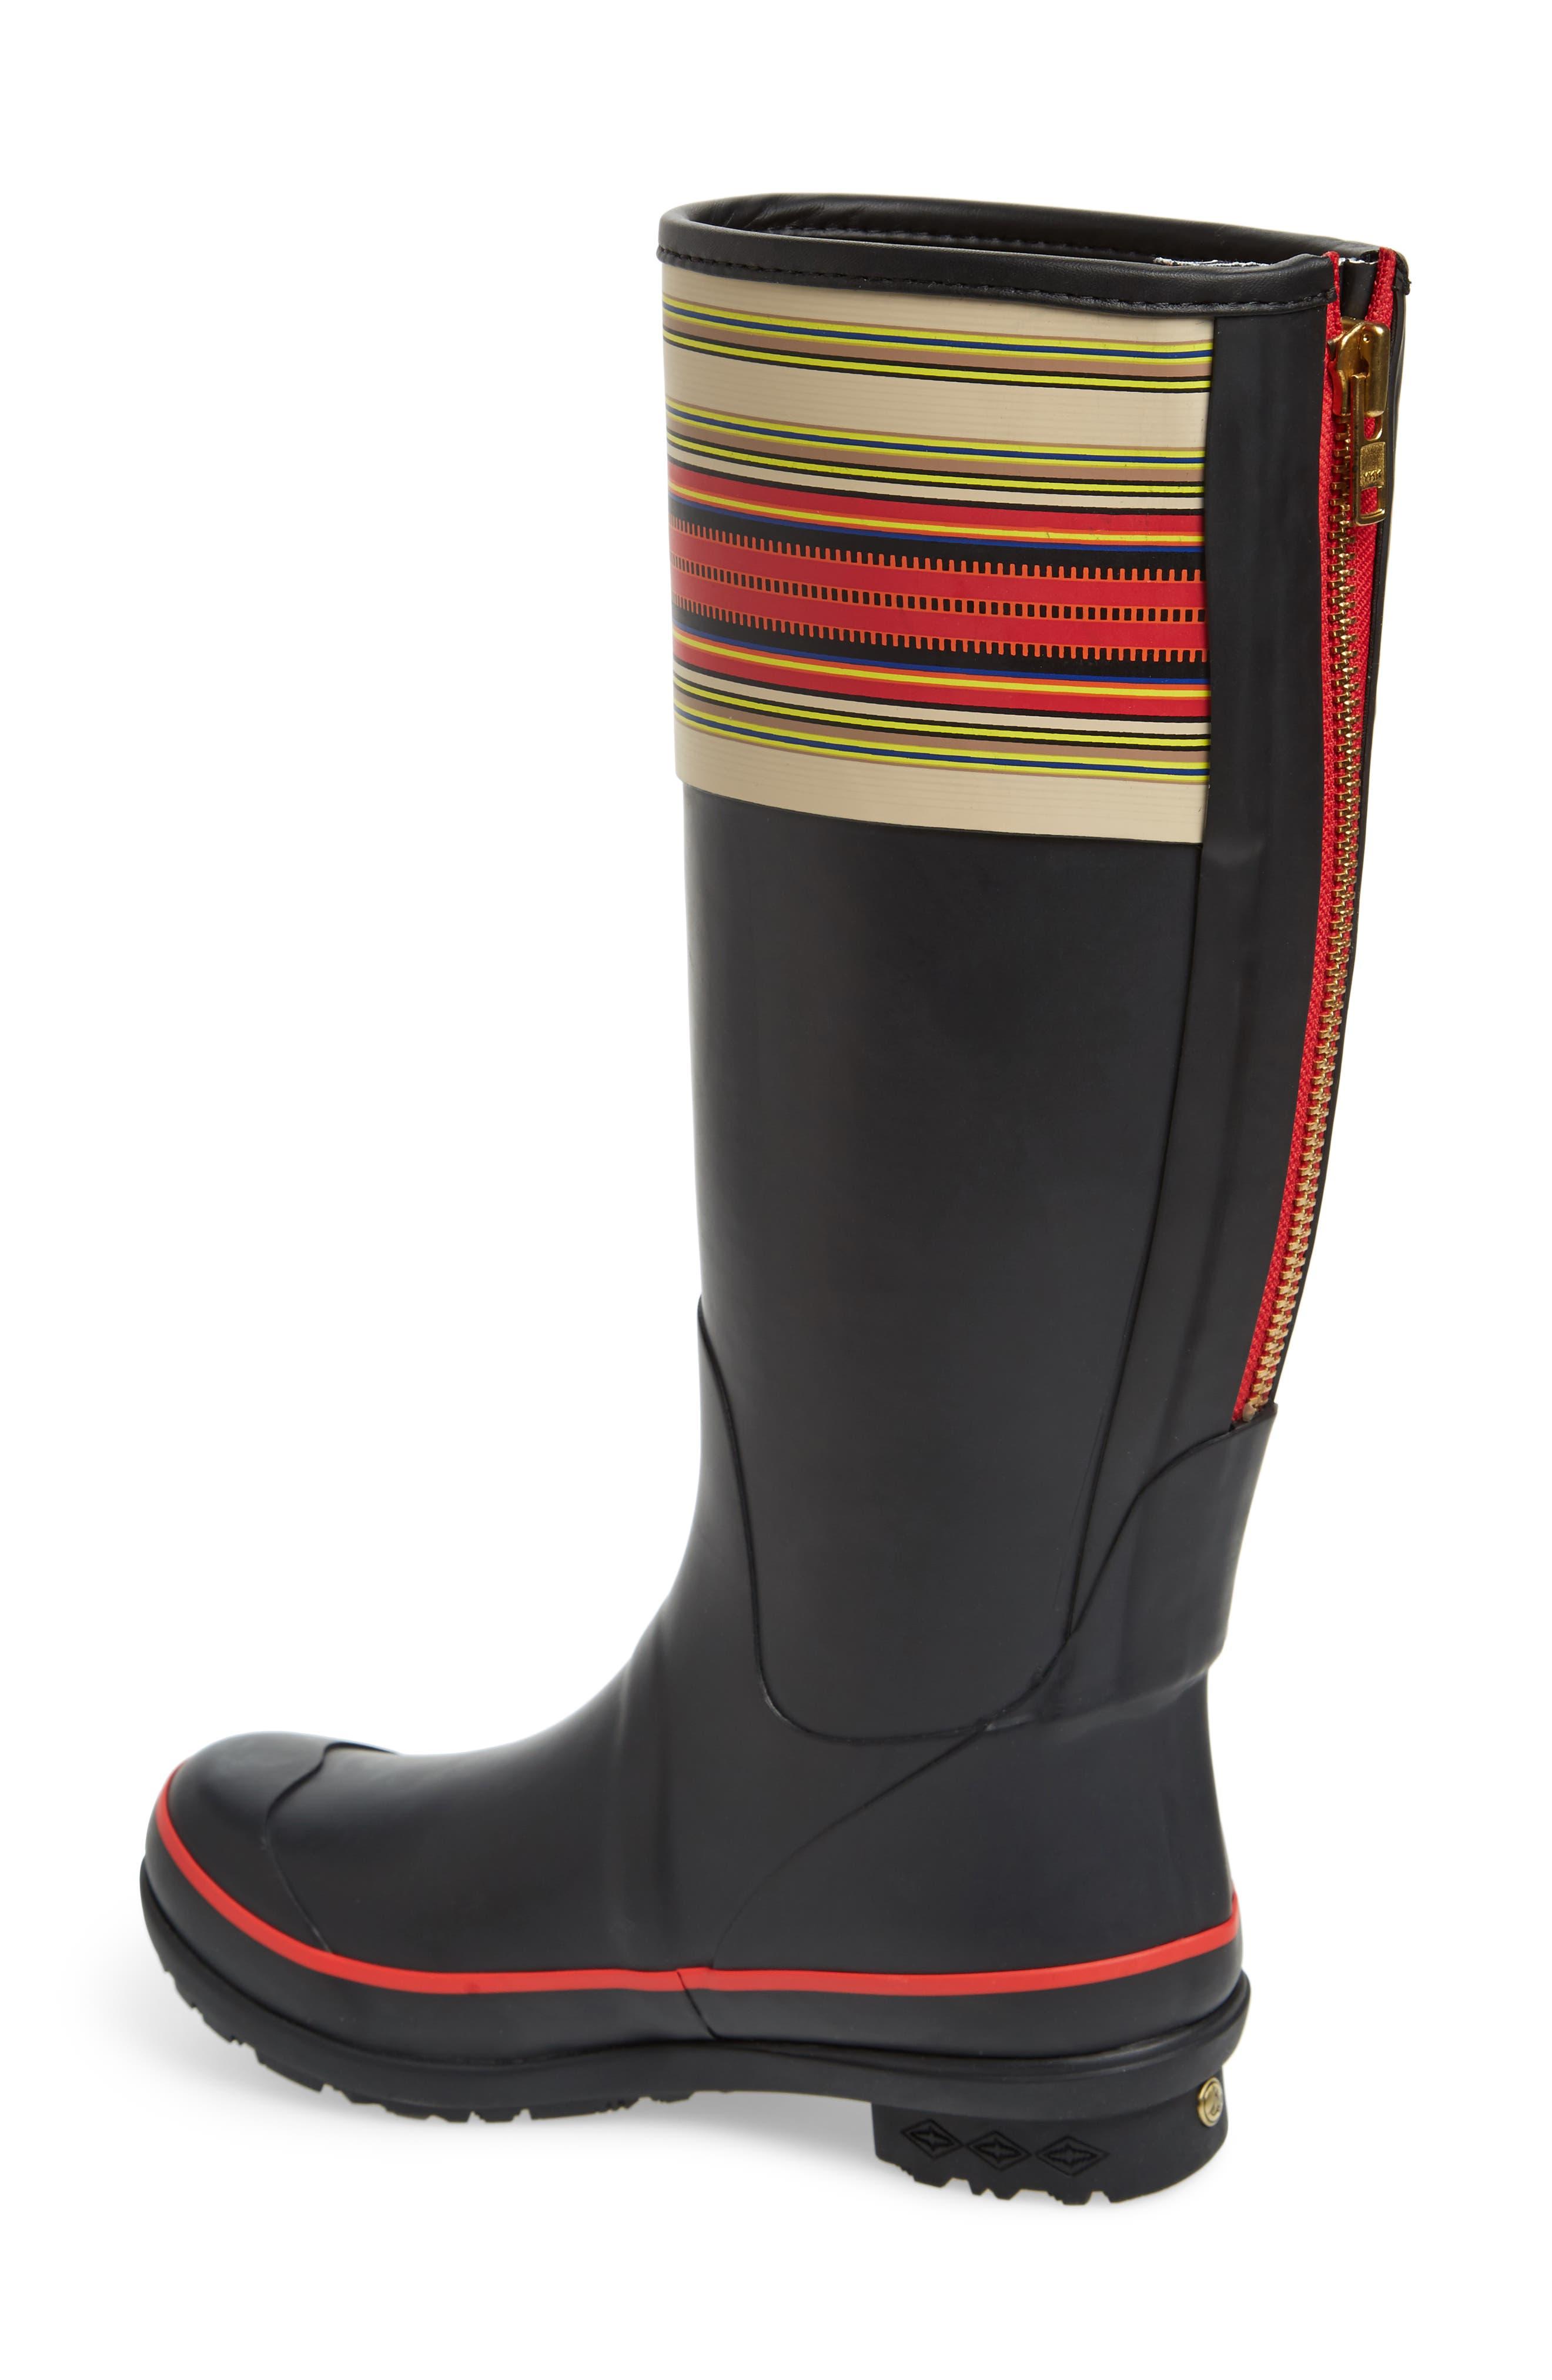 Pendleton Acadia National Park Tall Rain Boot,                             Alternate thumbnail 2, color,                             BLACK